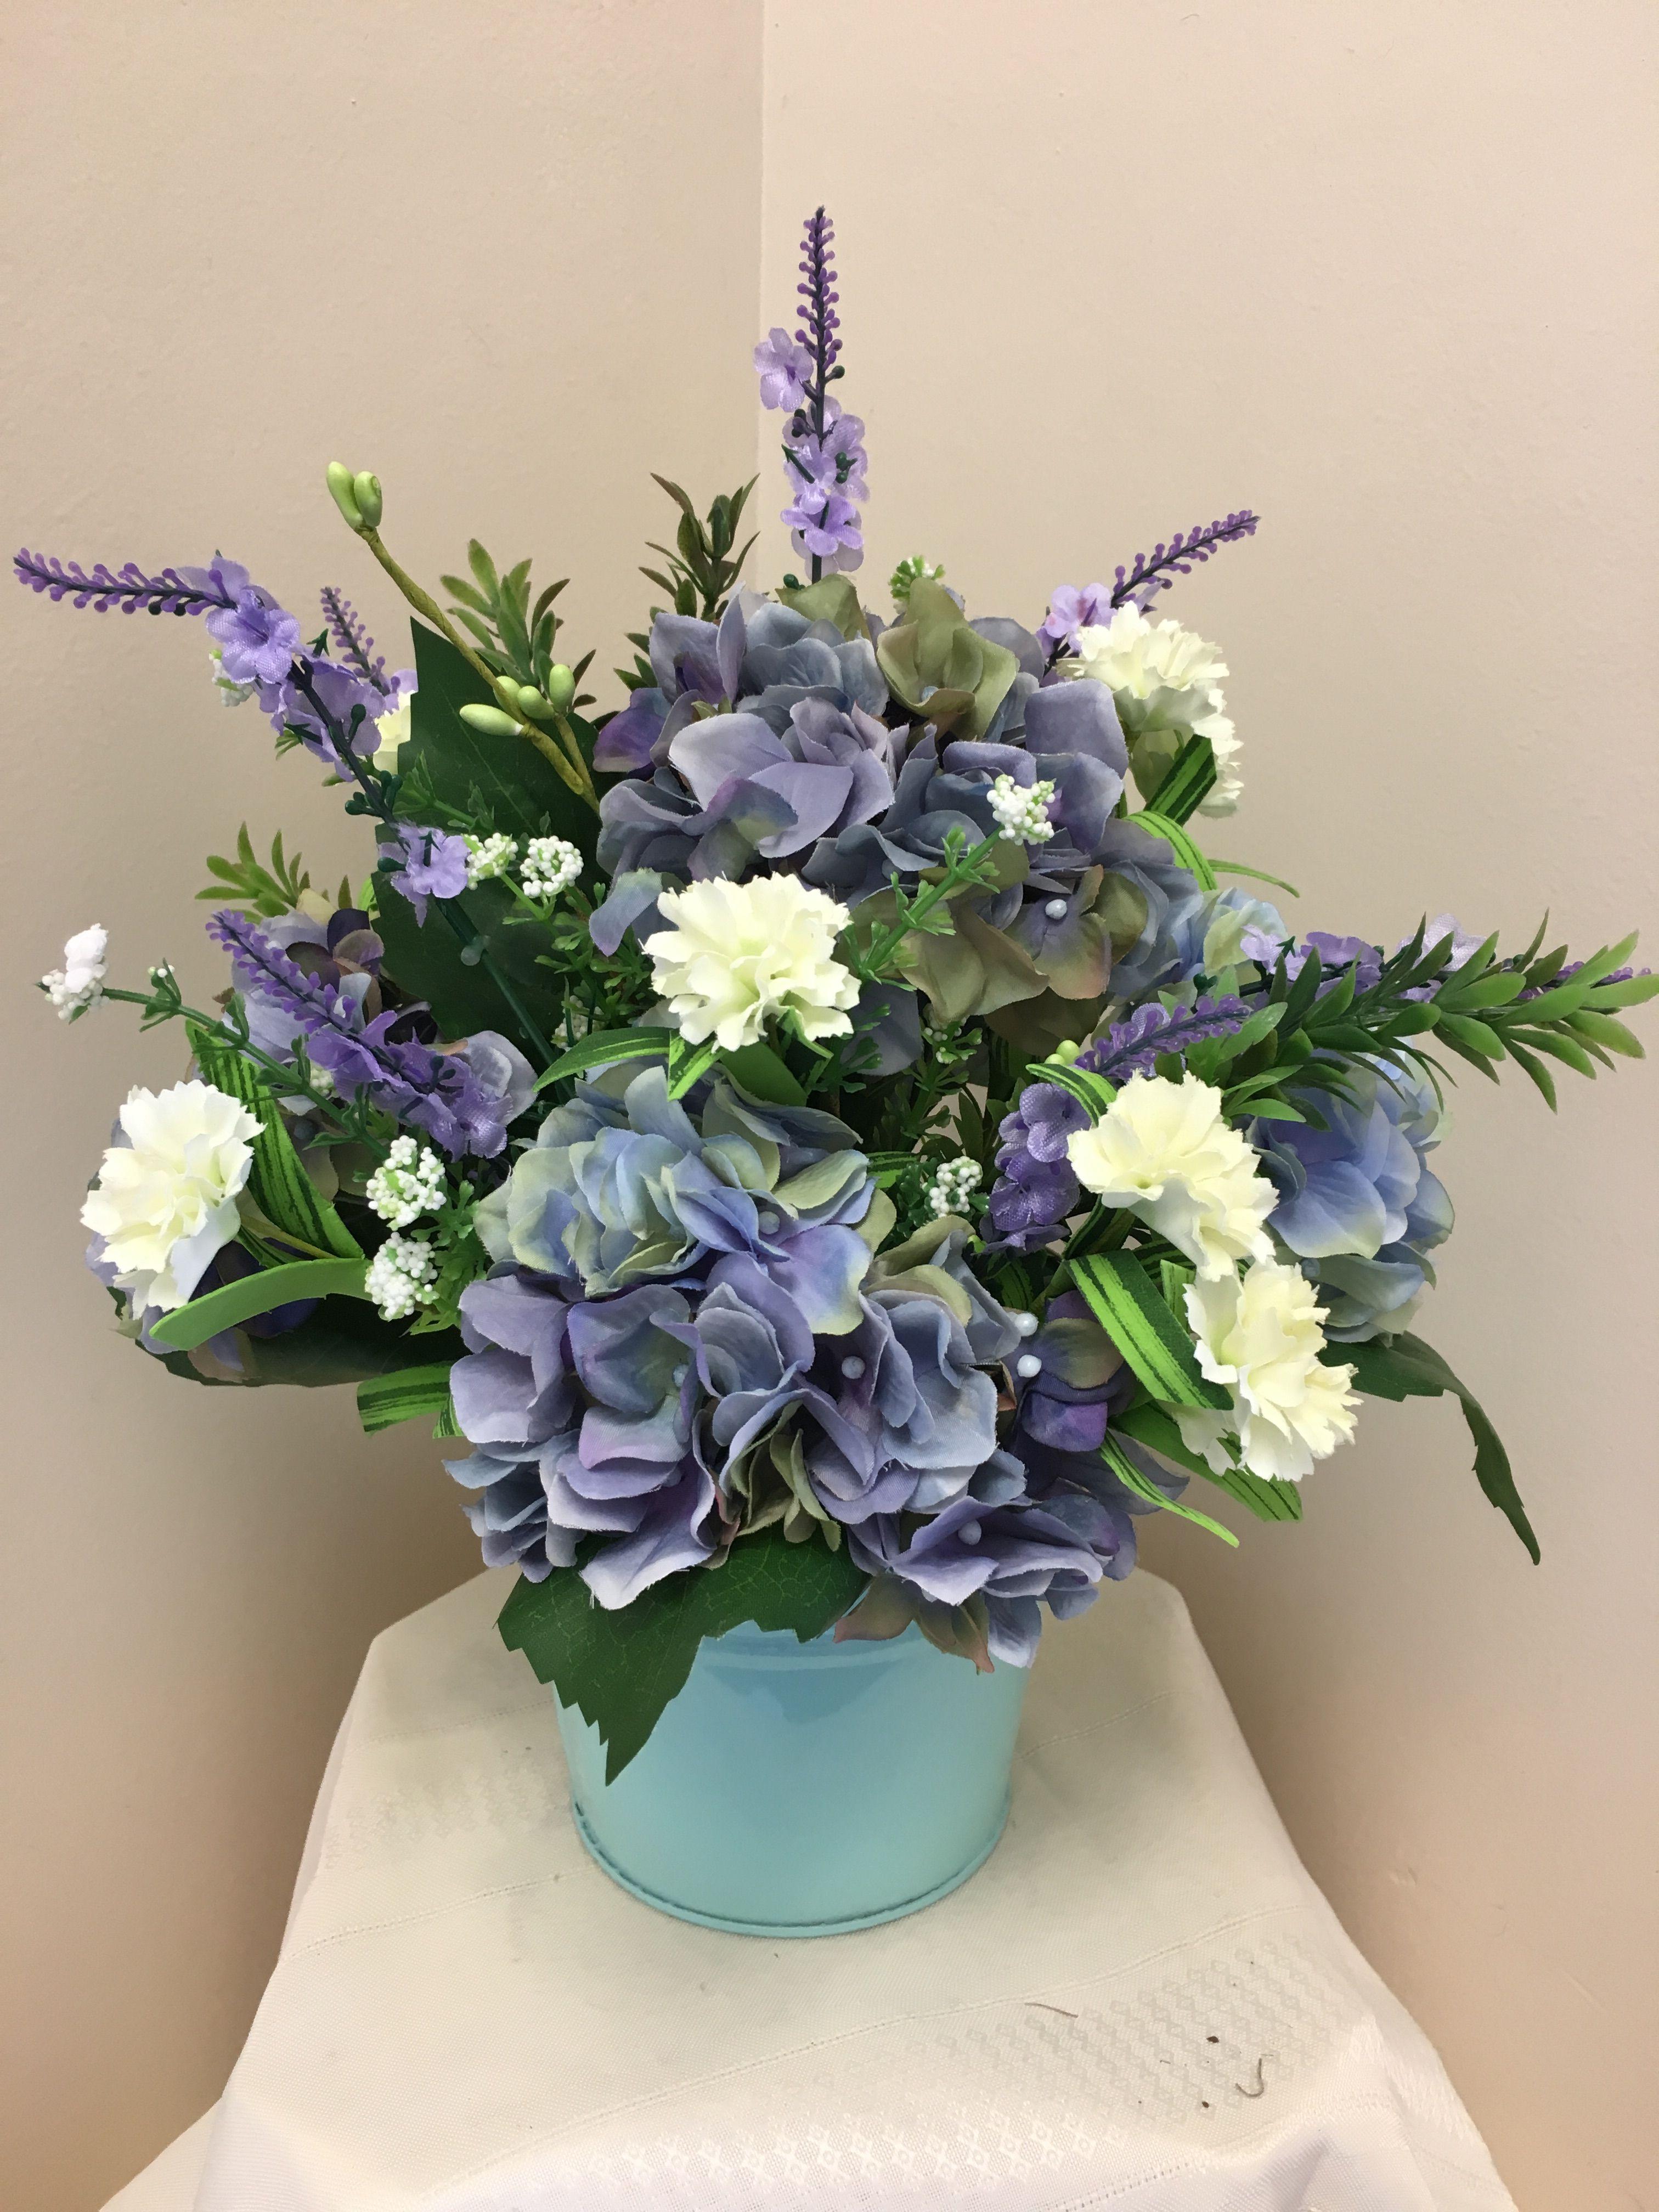 All Around Artificial Flower Arrangement In Aqua Tin With Blue Lavender Hydrangea And Cream Filler